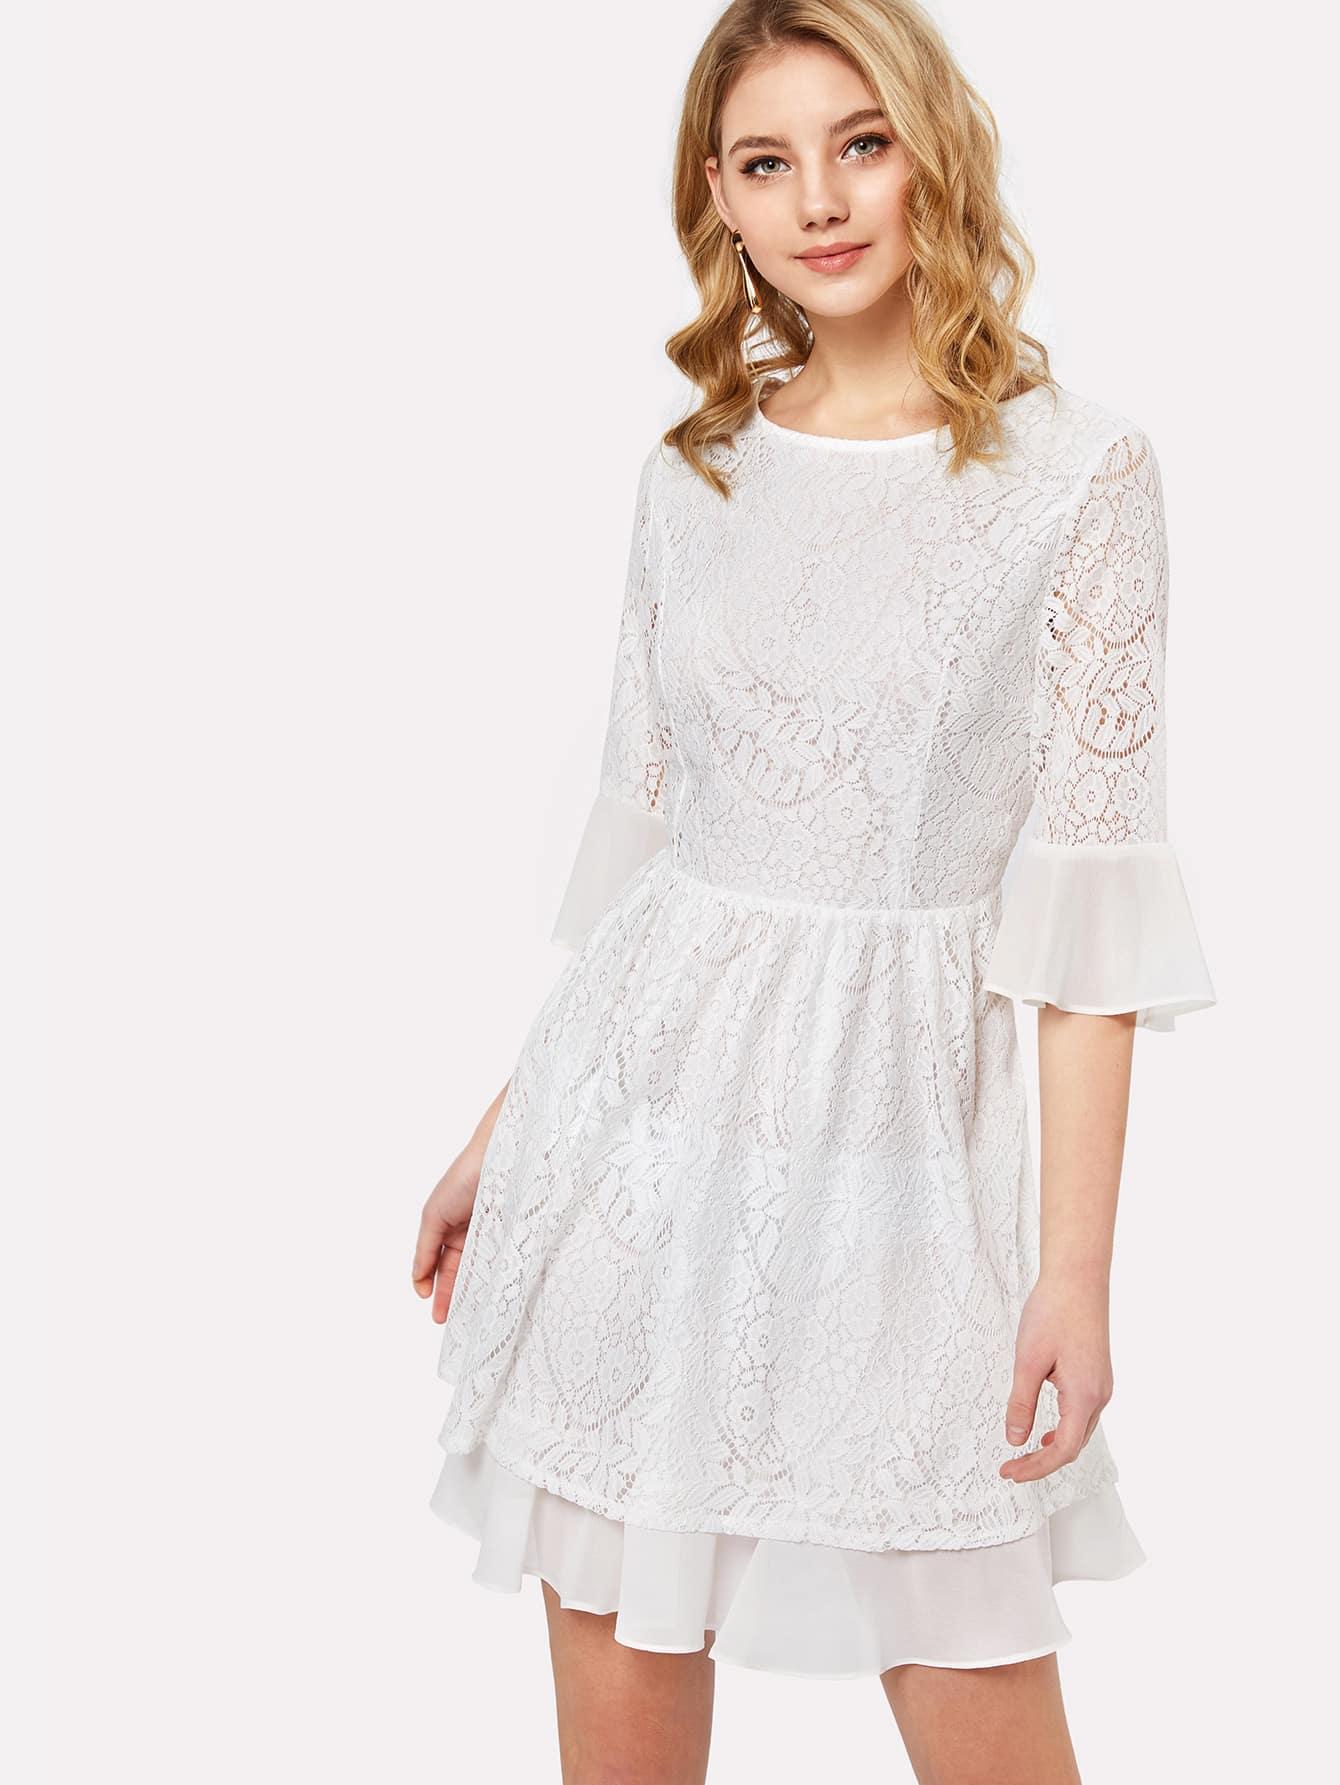 Flounce Sleeve Fit & Flare Dress flounce flare sleeve dress